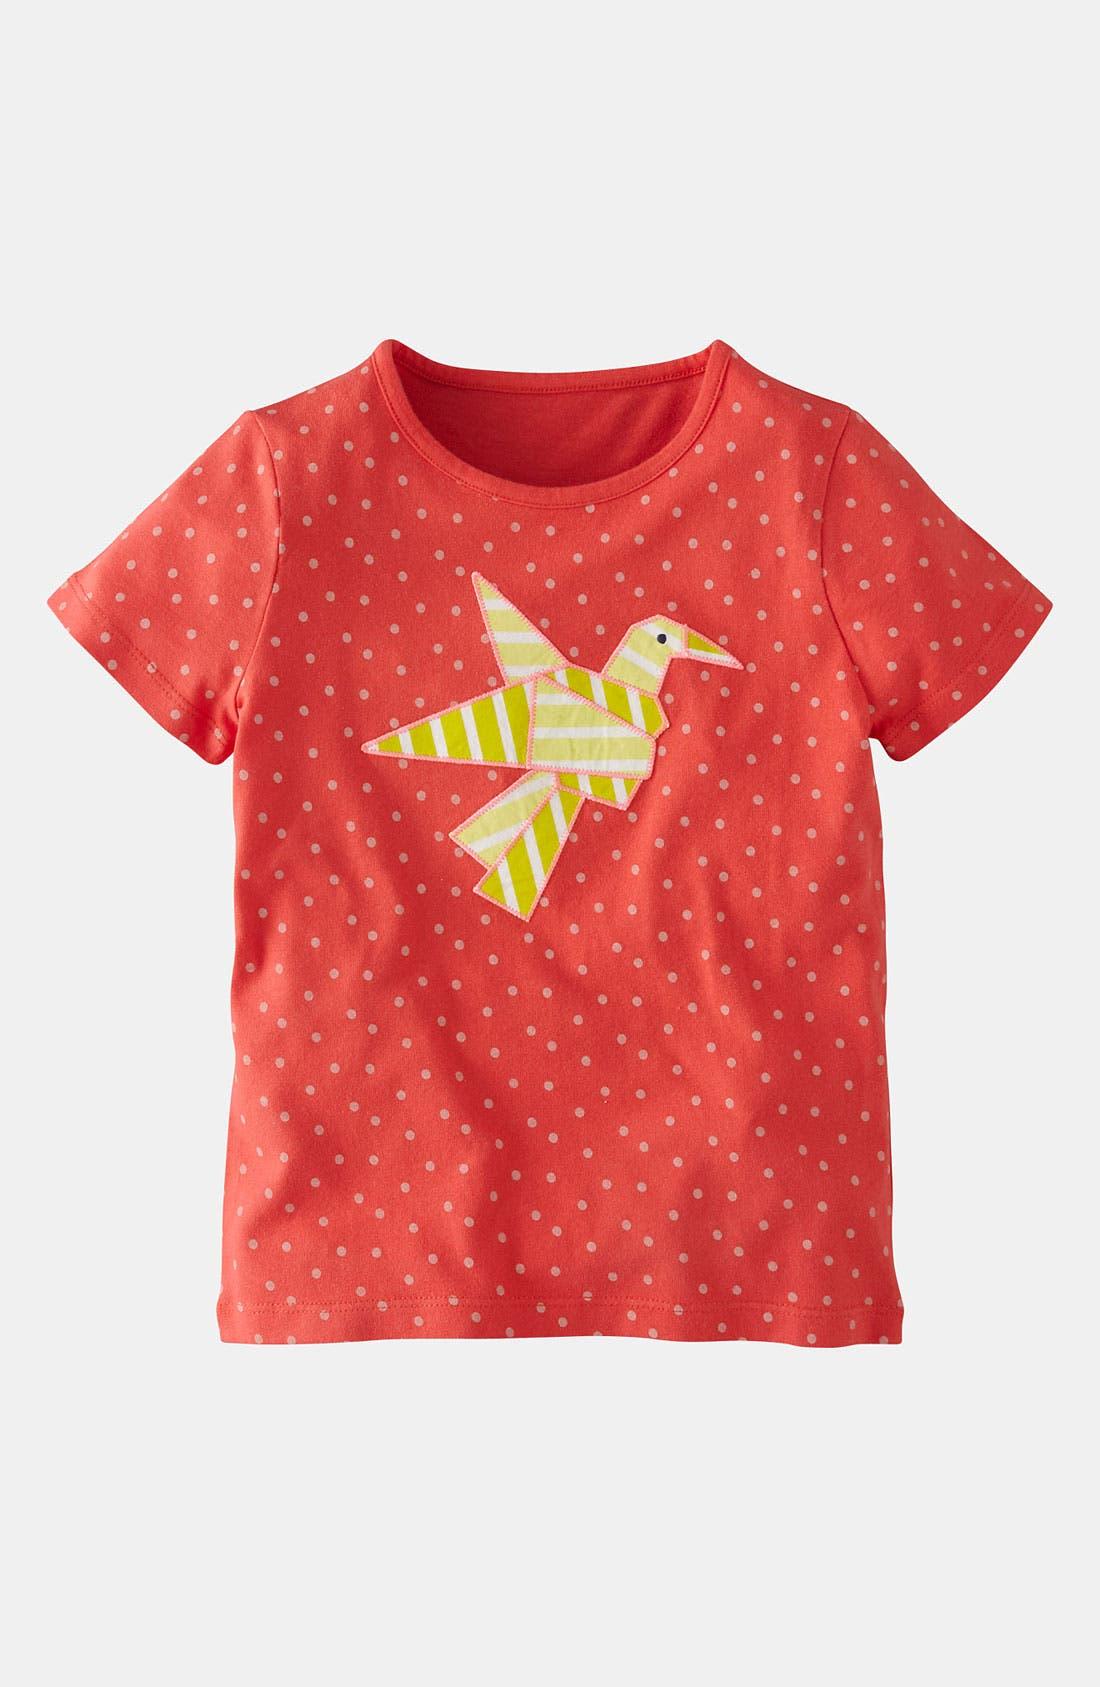 Alternate Image 1 Selected - Mini Boden 'Origami' Appliqué Tee (Little Girls & Big Girls)